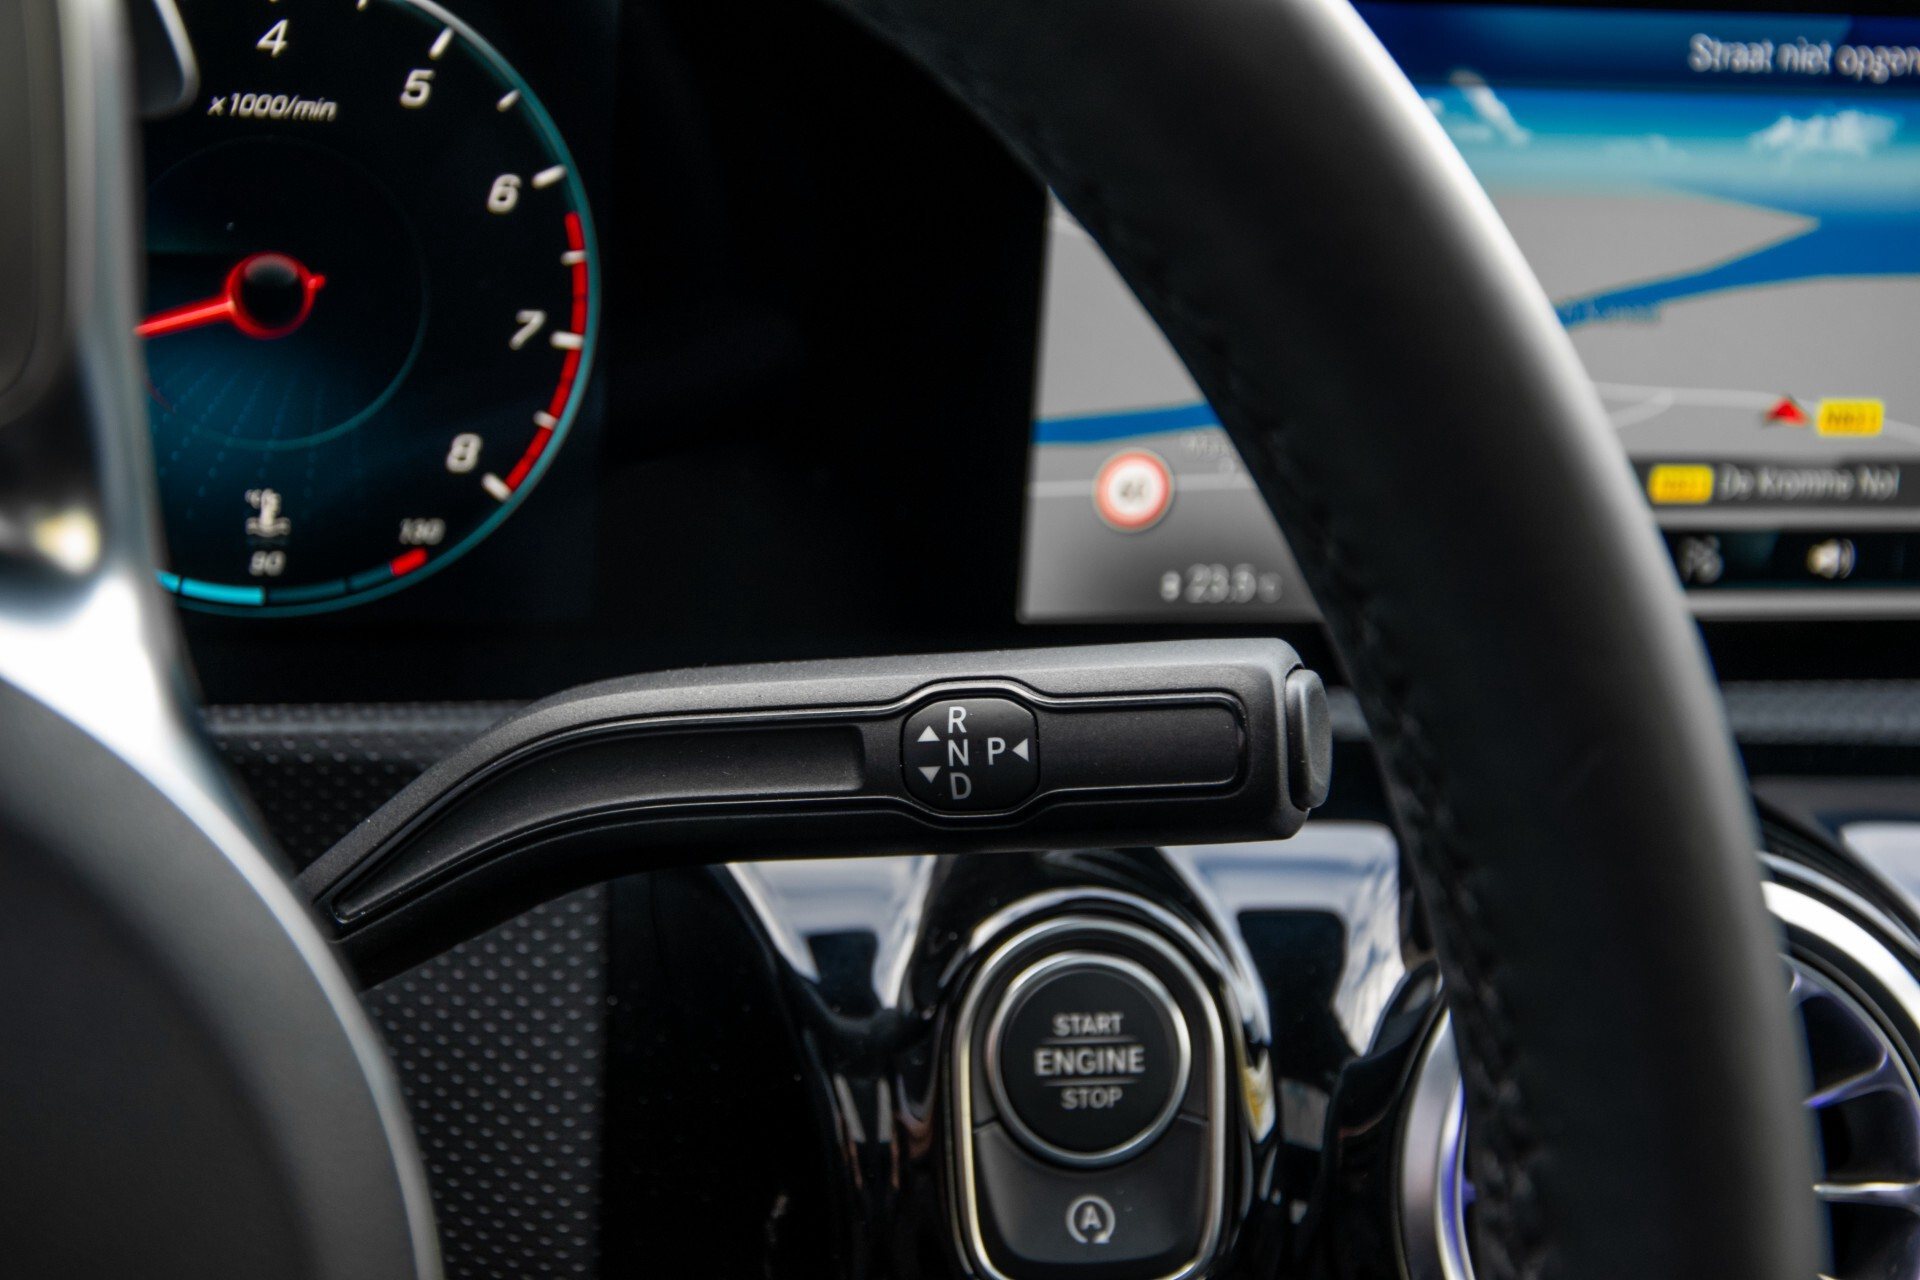 Mercedes-Benz A-Klasse 250 4-M AMG Panorama/Keyless-Entry/MBUX/HUD/Burmester/360/Multibeam LED Aut7 Foto 15